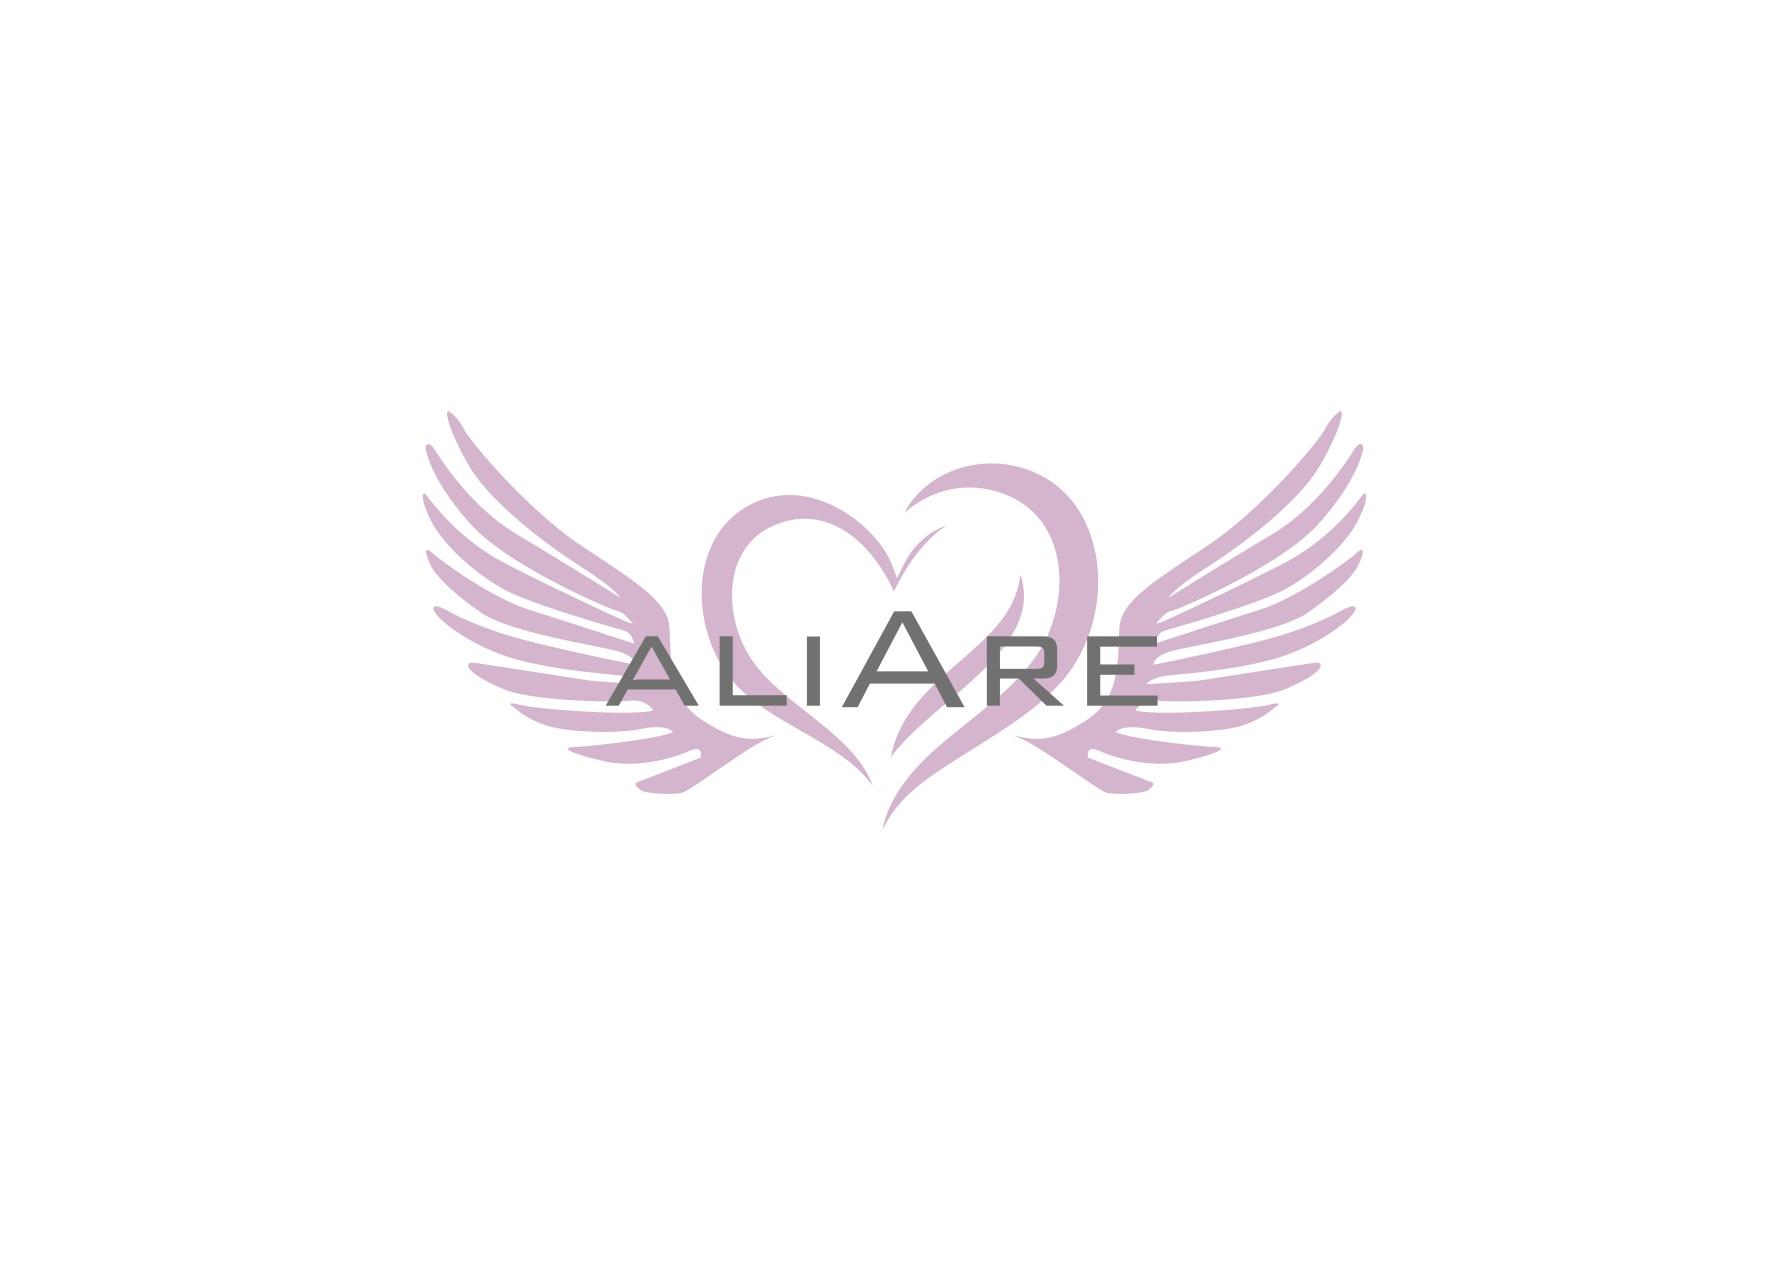 ALIARE(アリアーレ)